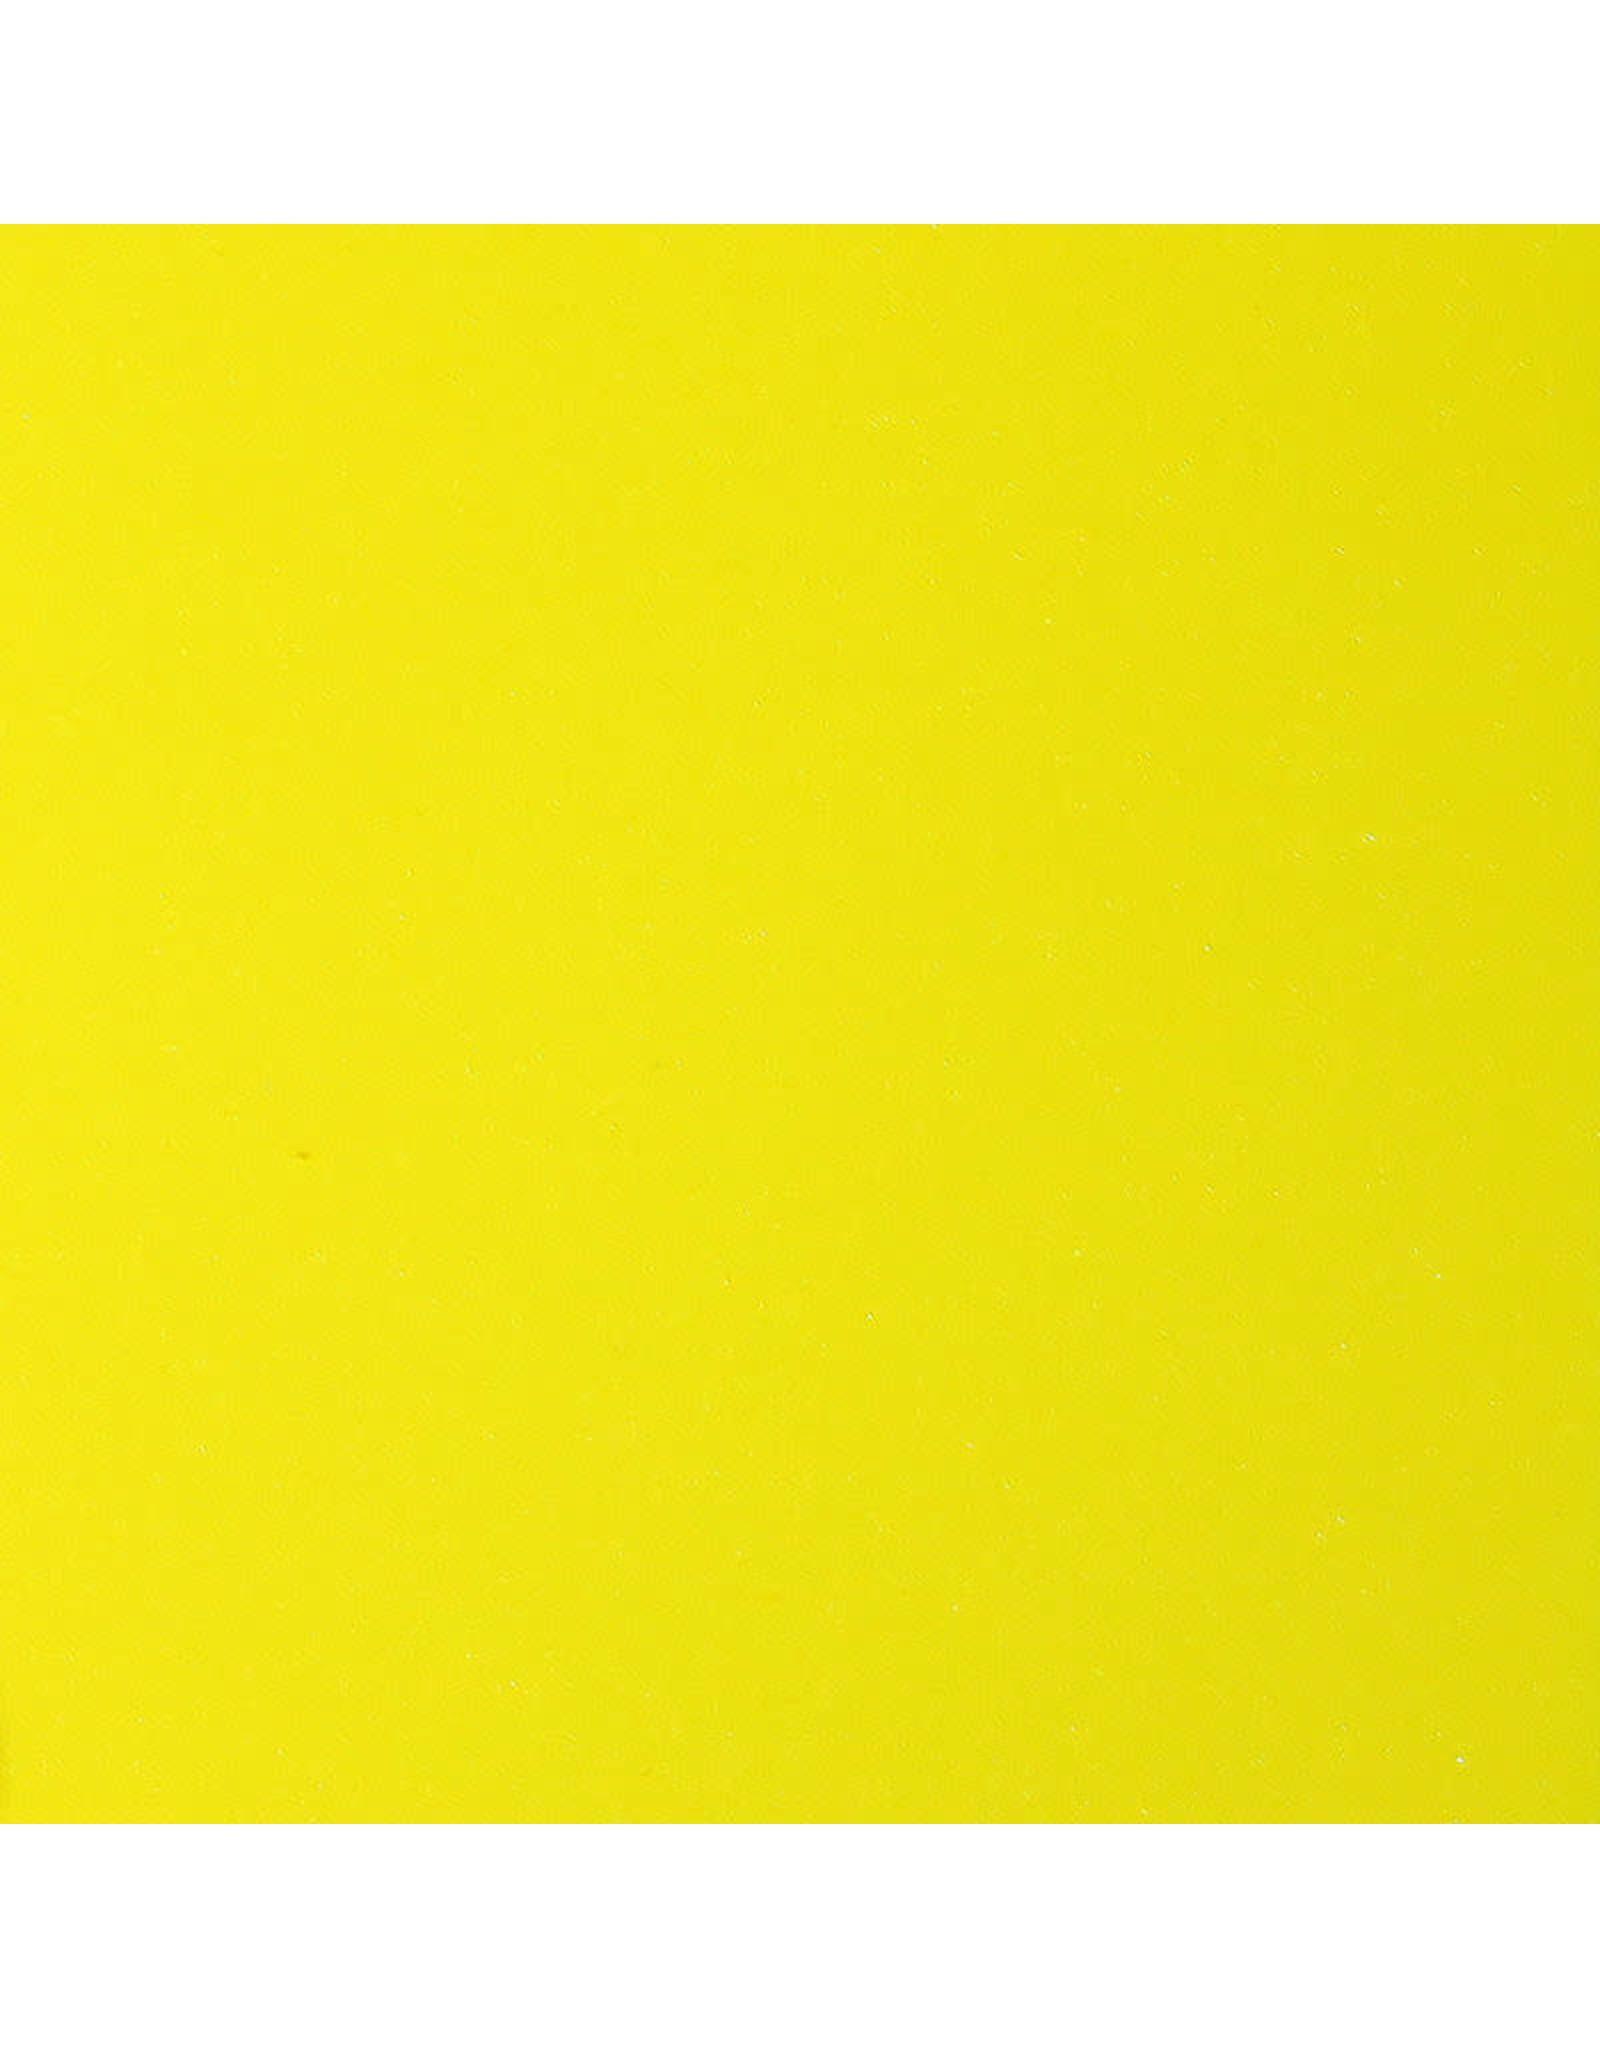 Simms Thin Fly Foam 2mm Yellow 2FF383